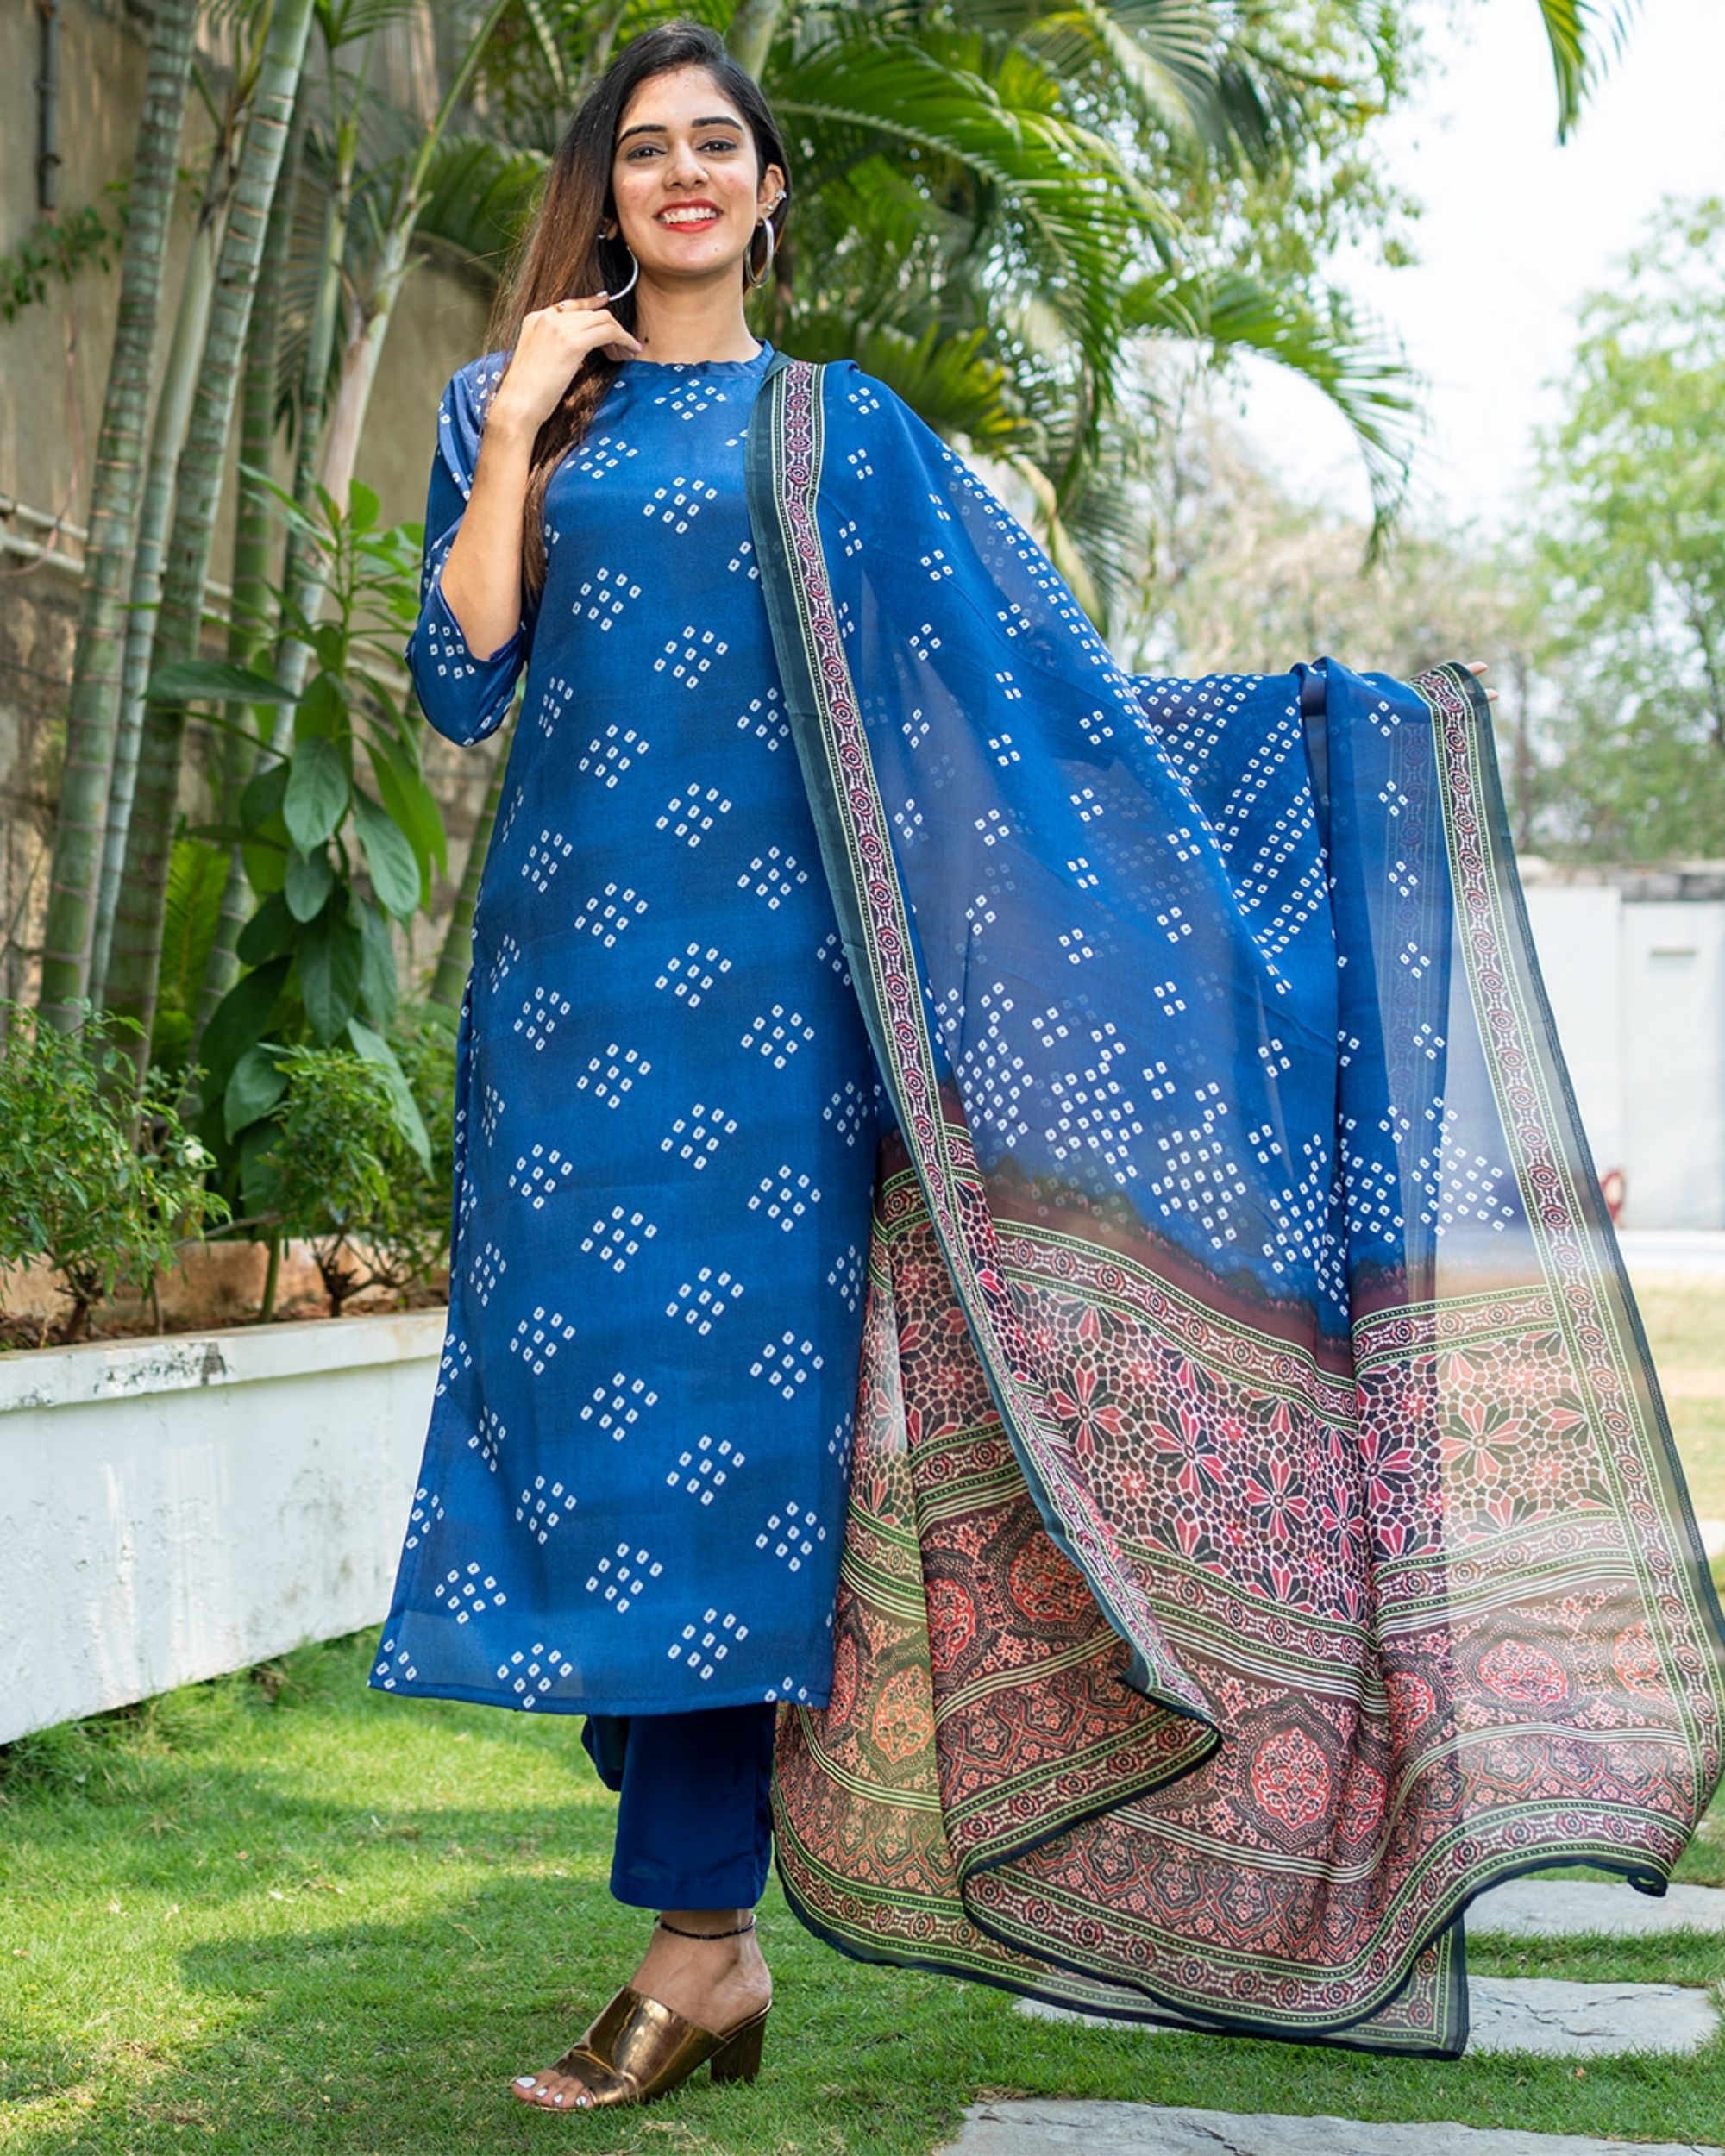 Blue bandhini kurta with organza dupatta - set of two